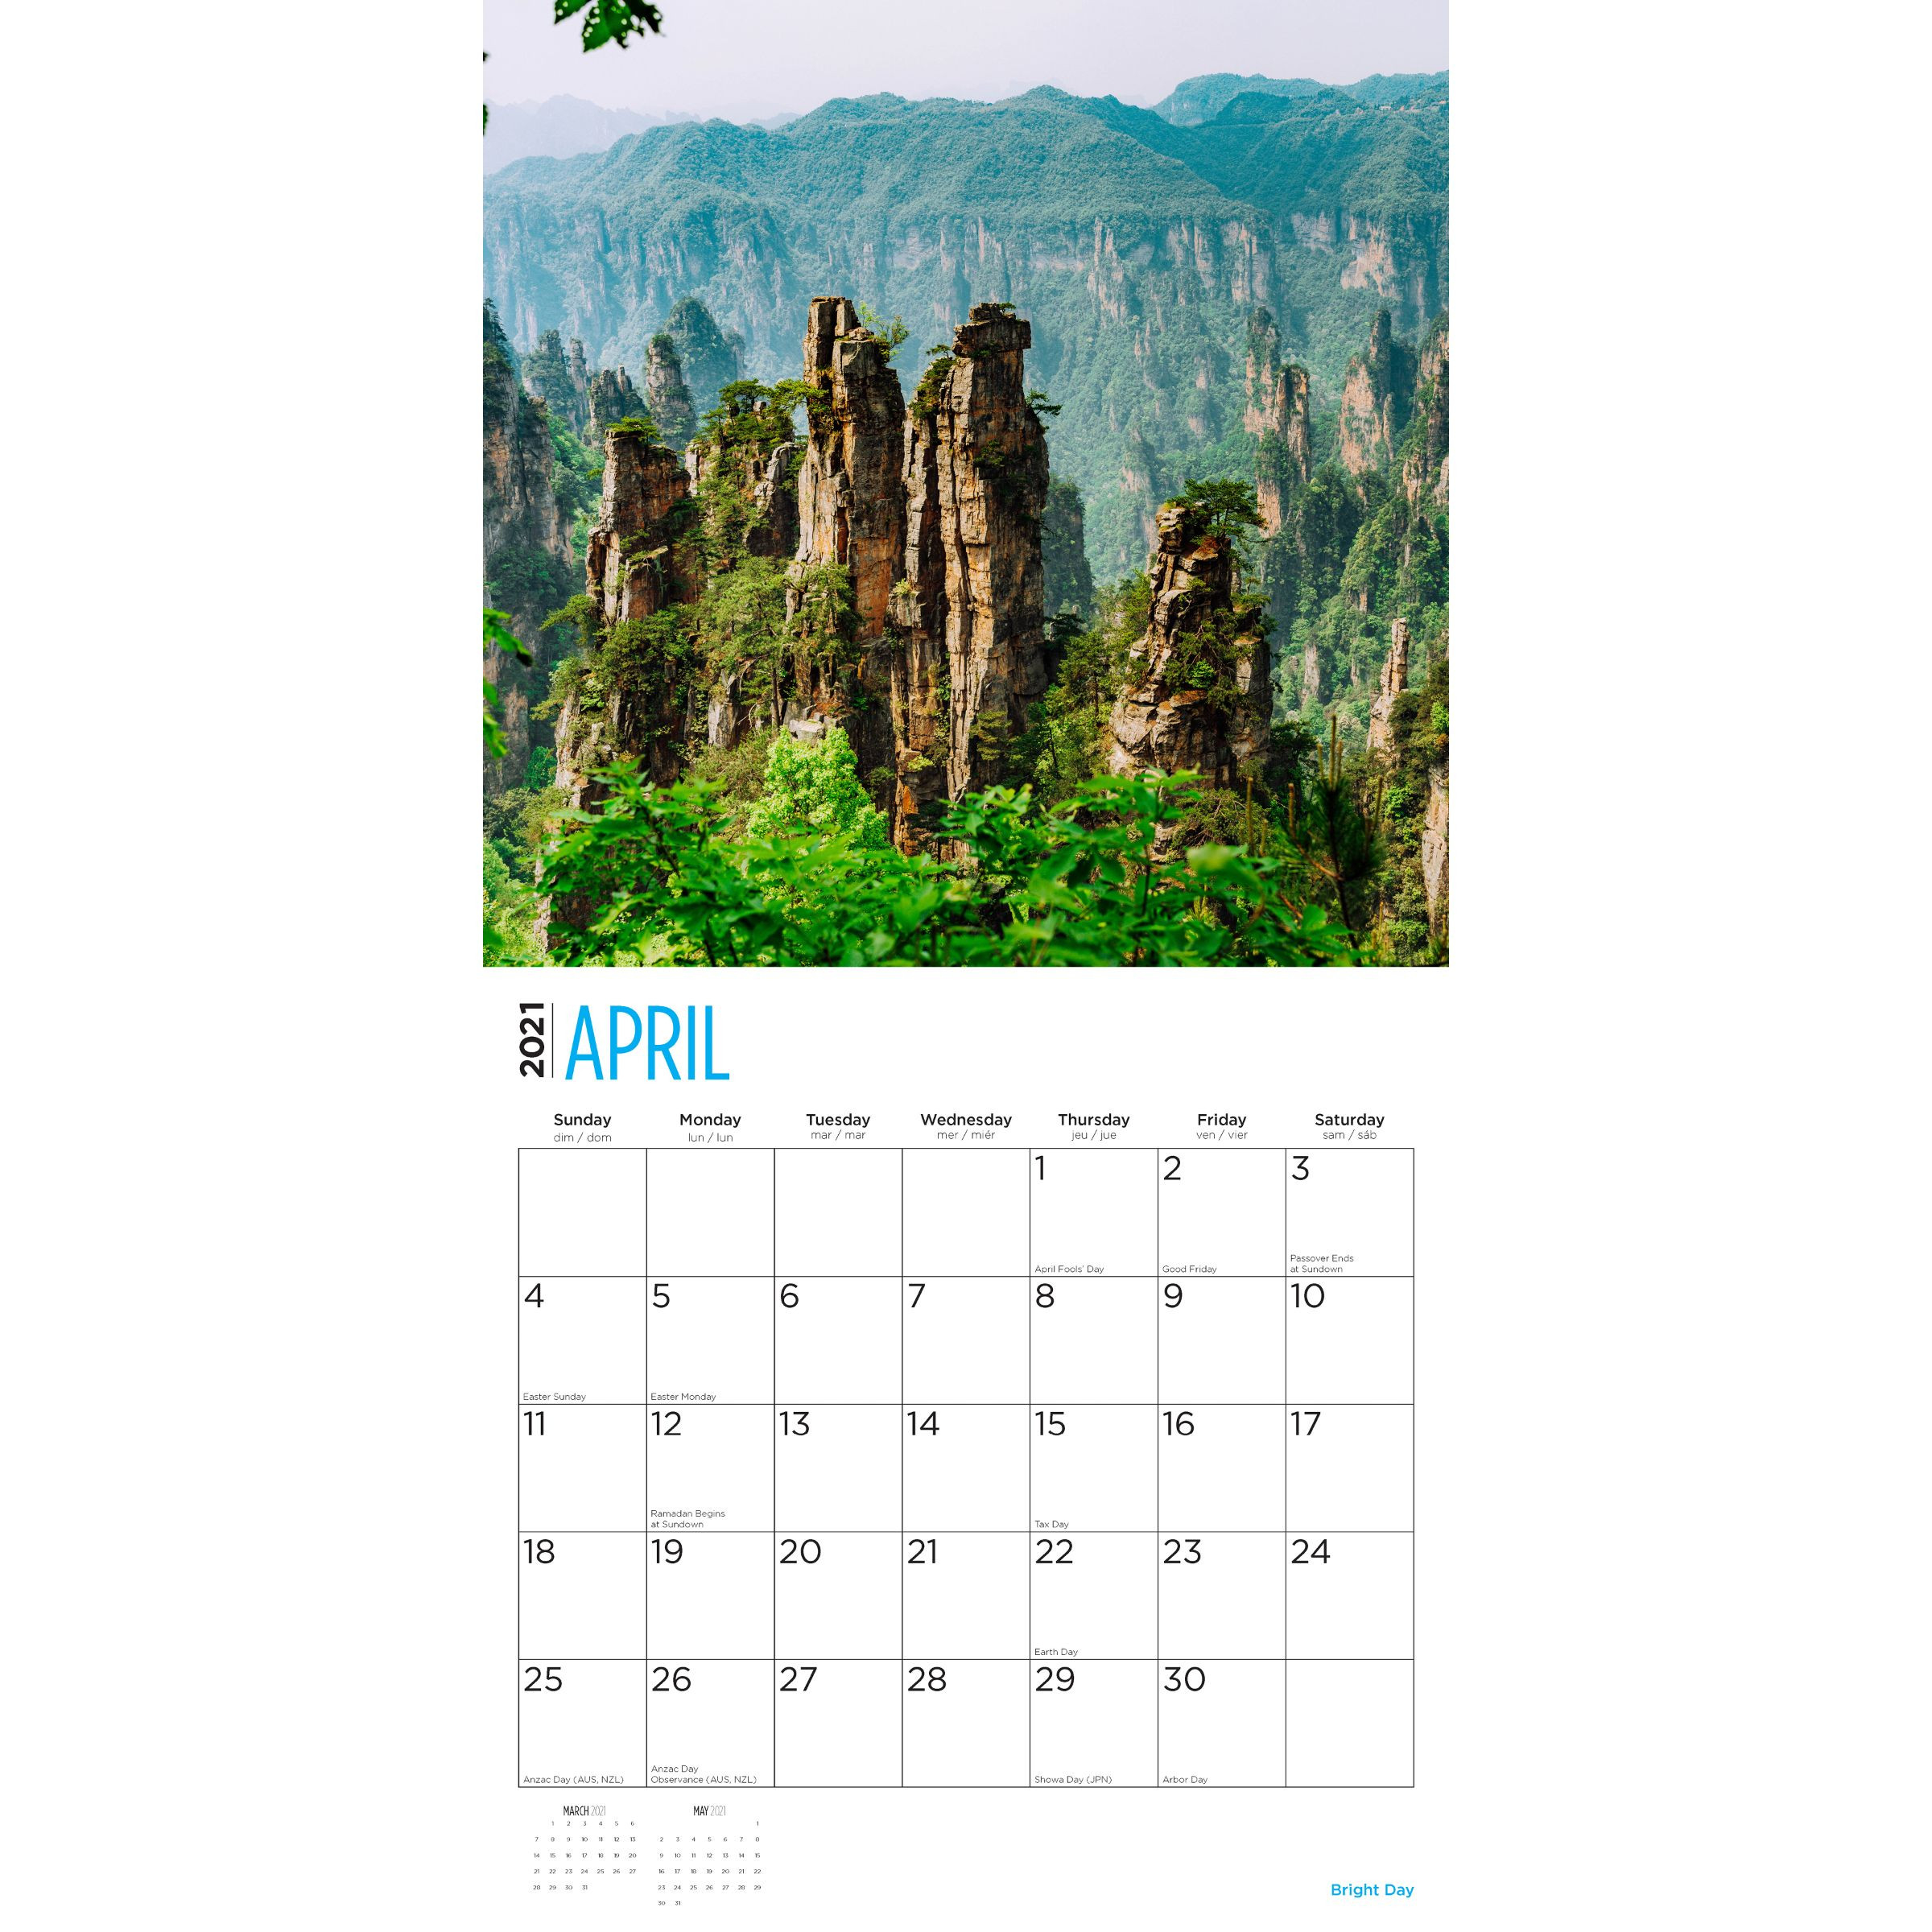 2021 World Travel Wall Calendar - Bright Day Calendars-Day To Day Calendar 2021